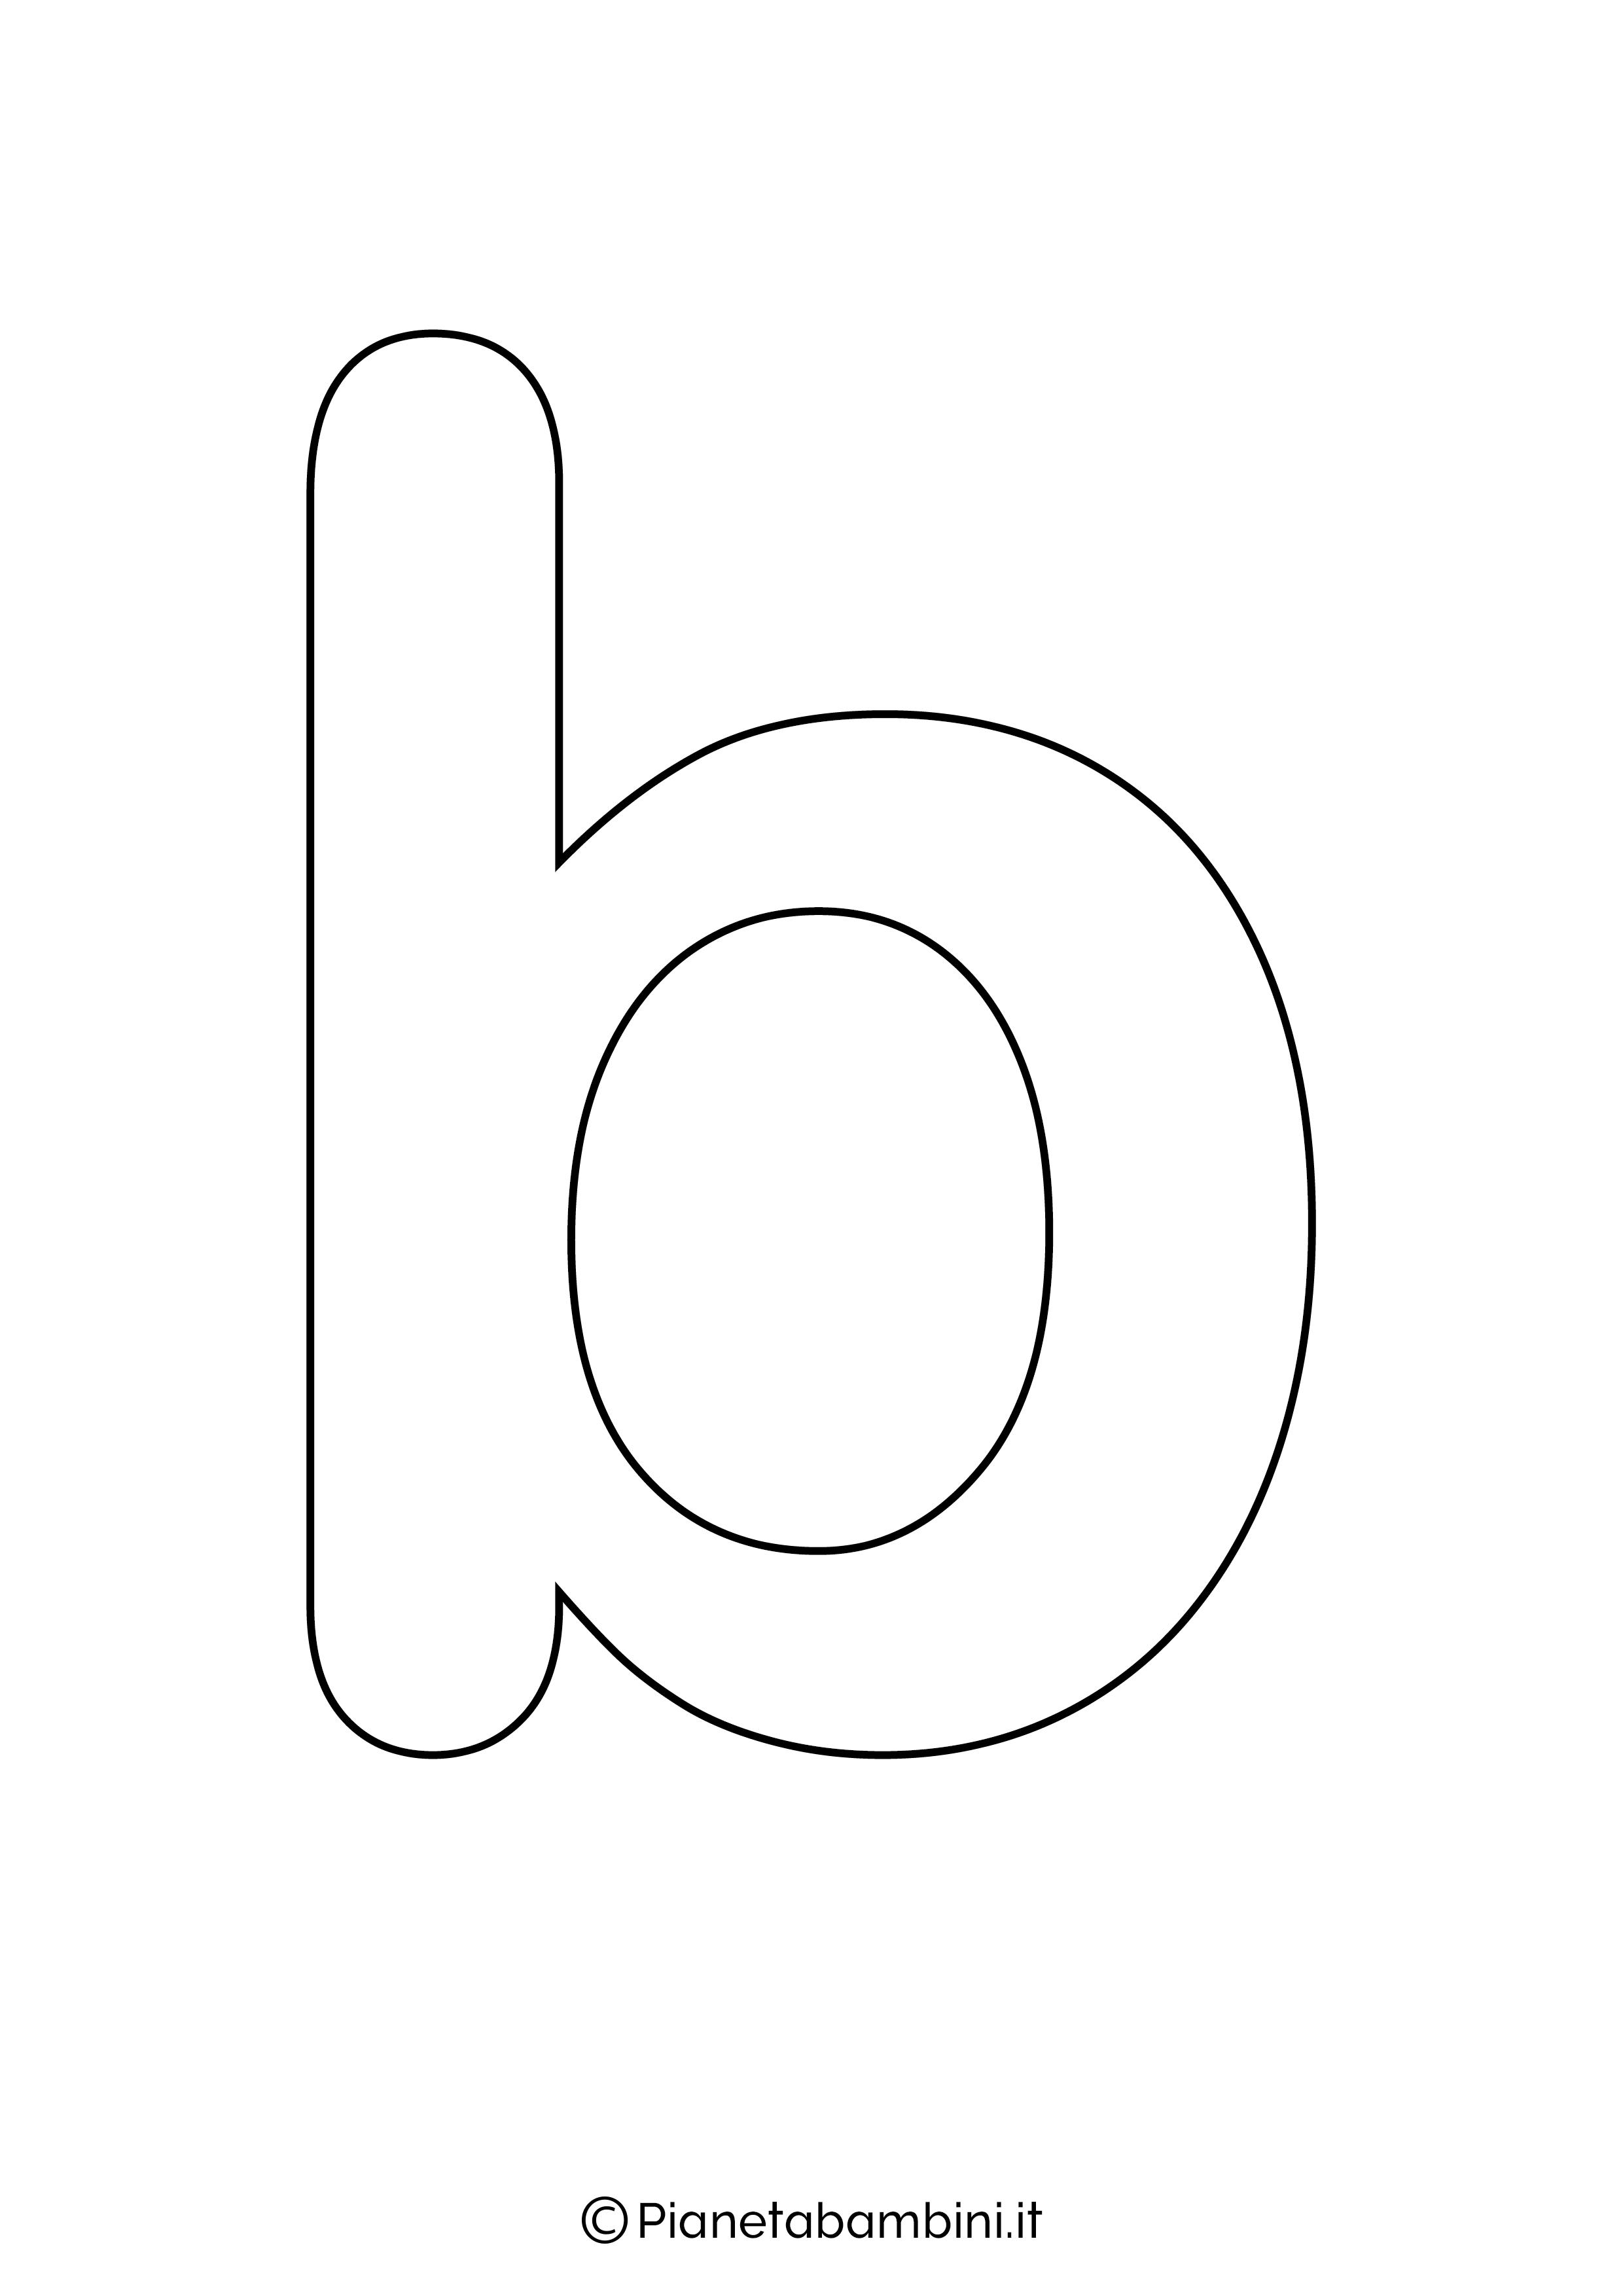 Lettera B minuscola da stampare